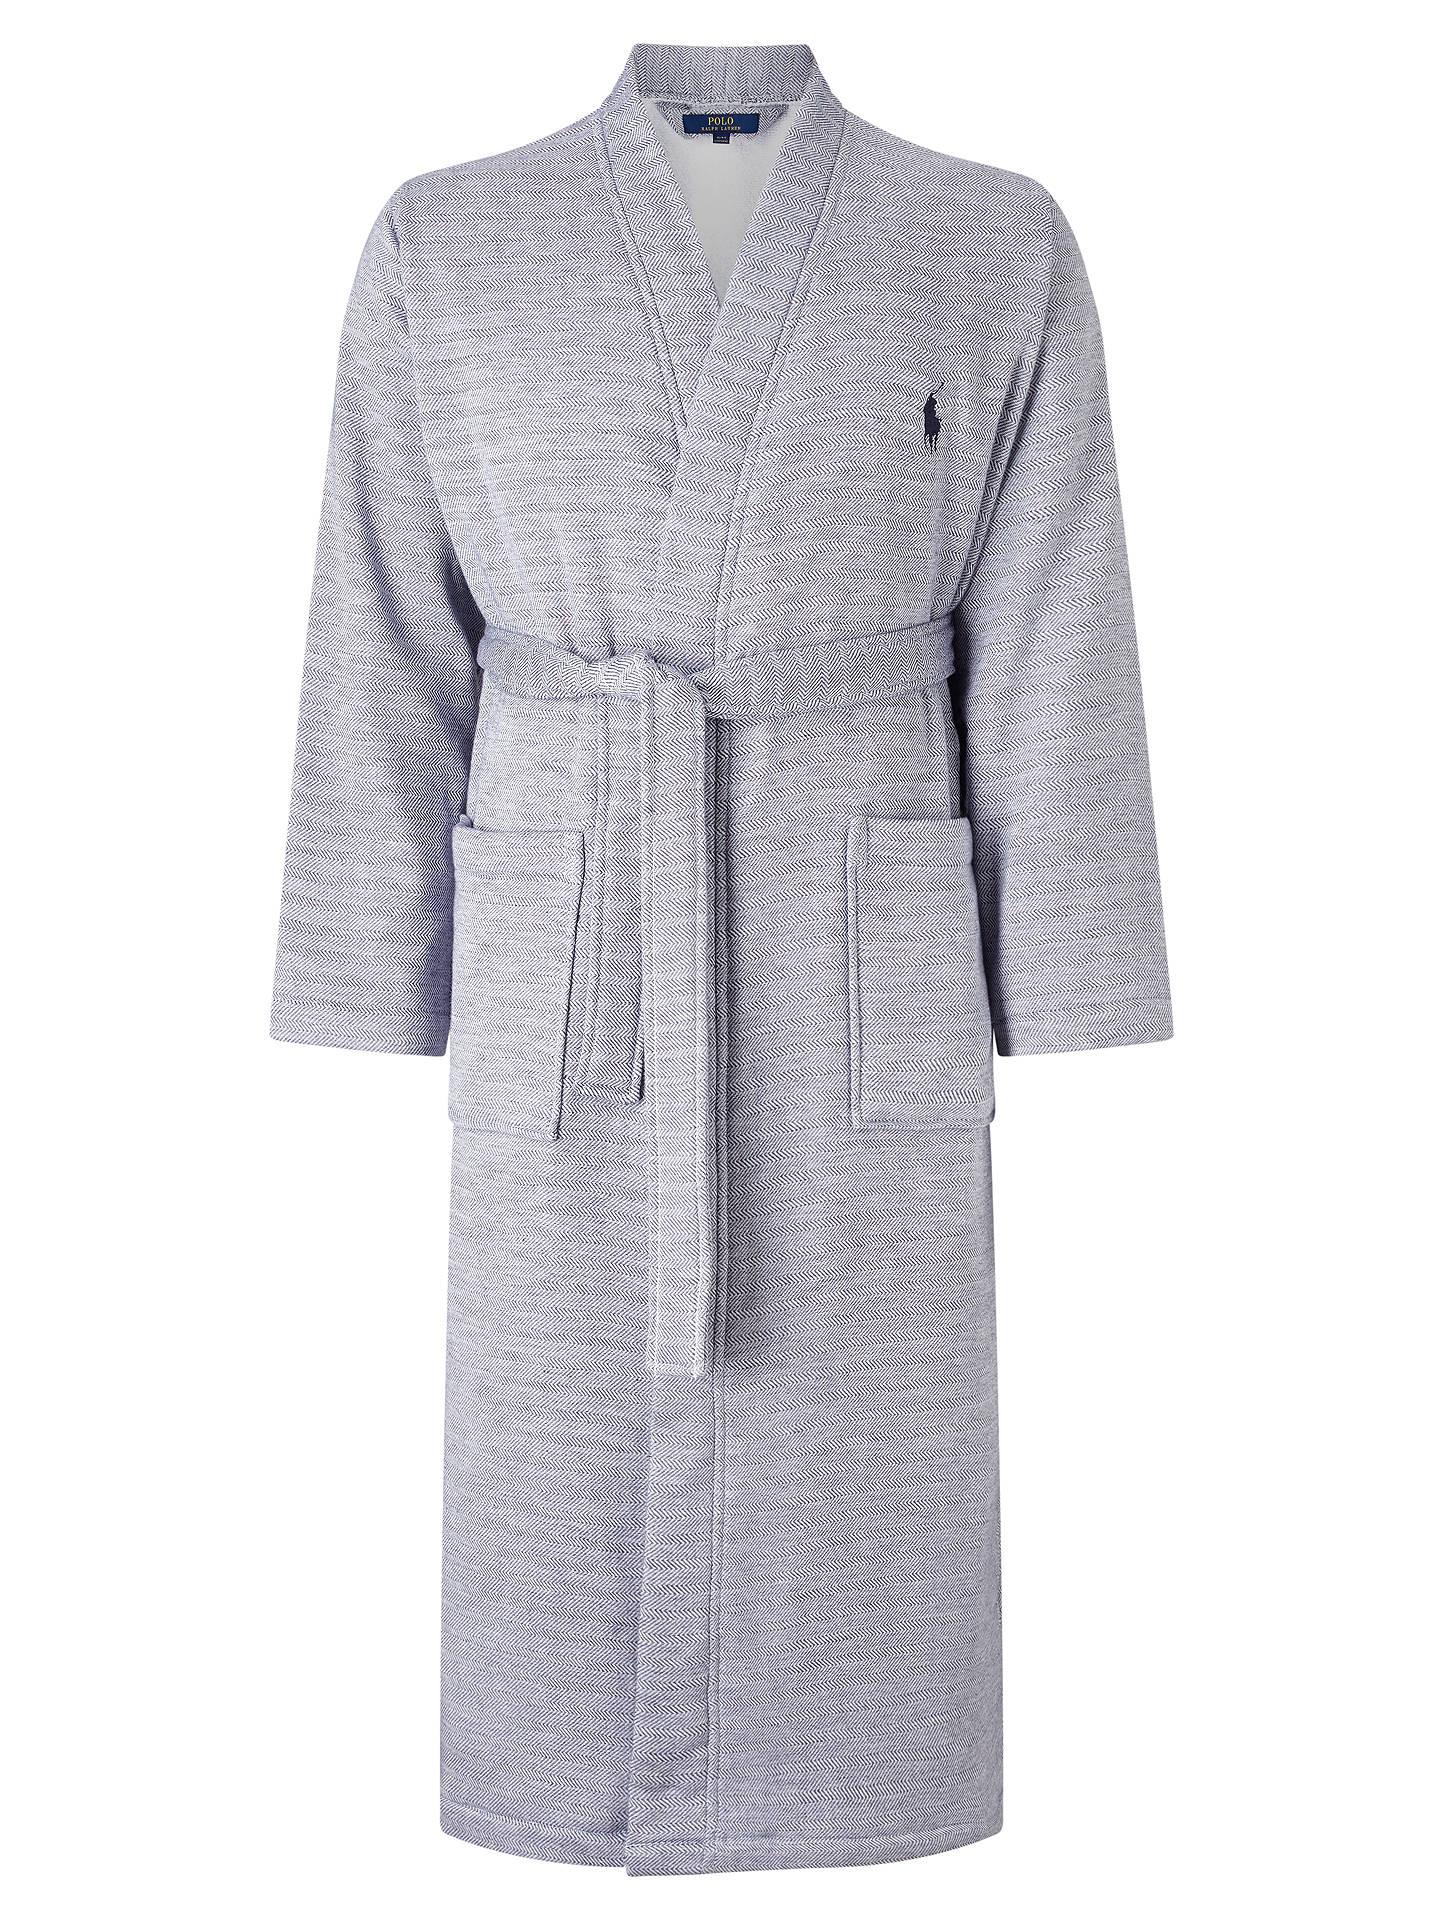 d13db7fa86 BuyPolo Ralph Lauren Herringbone Cotton Robe